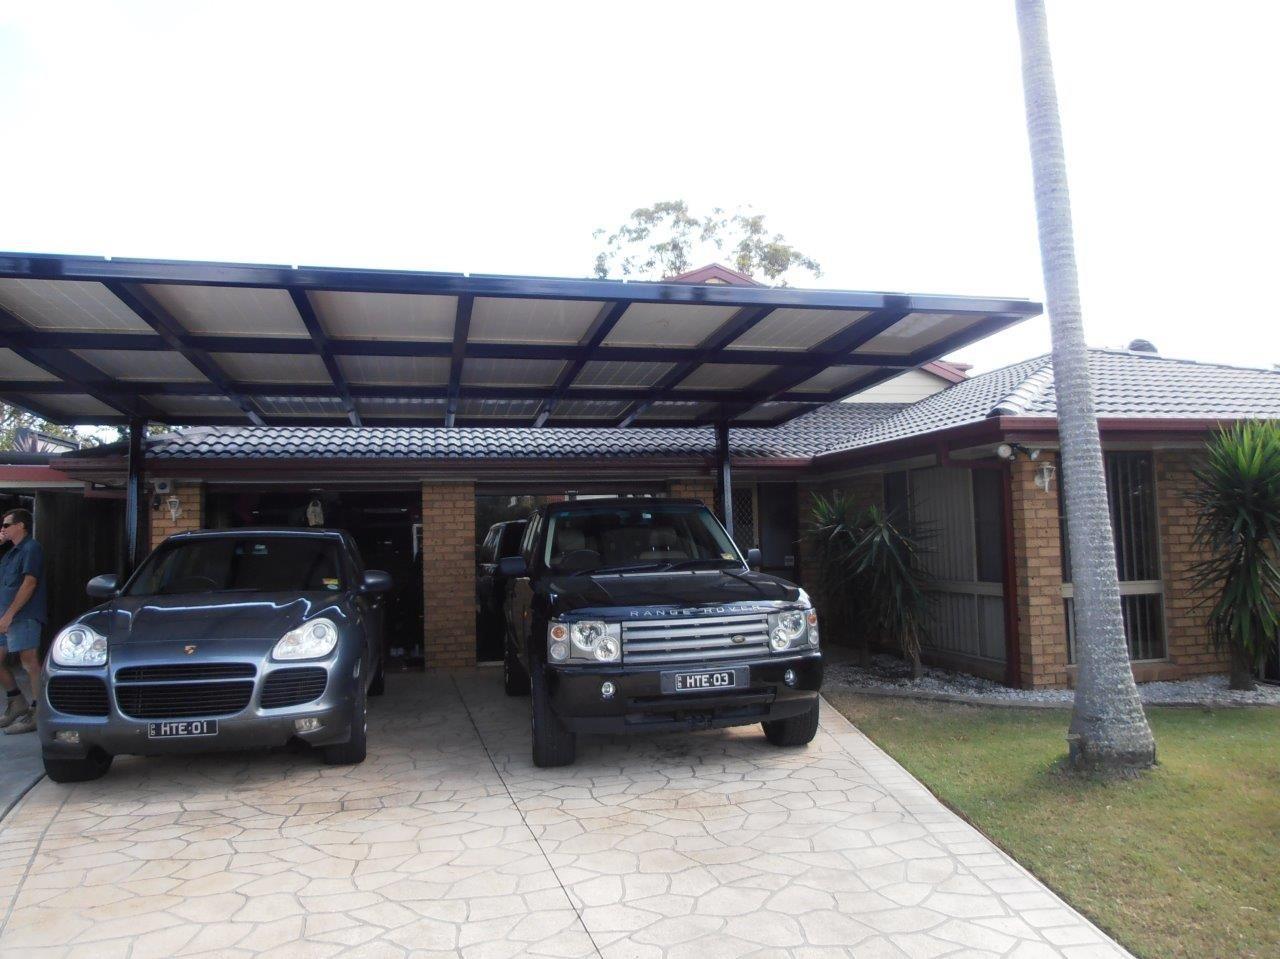 Carport & Solar Panel Structure. Cantilevered steel